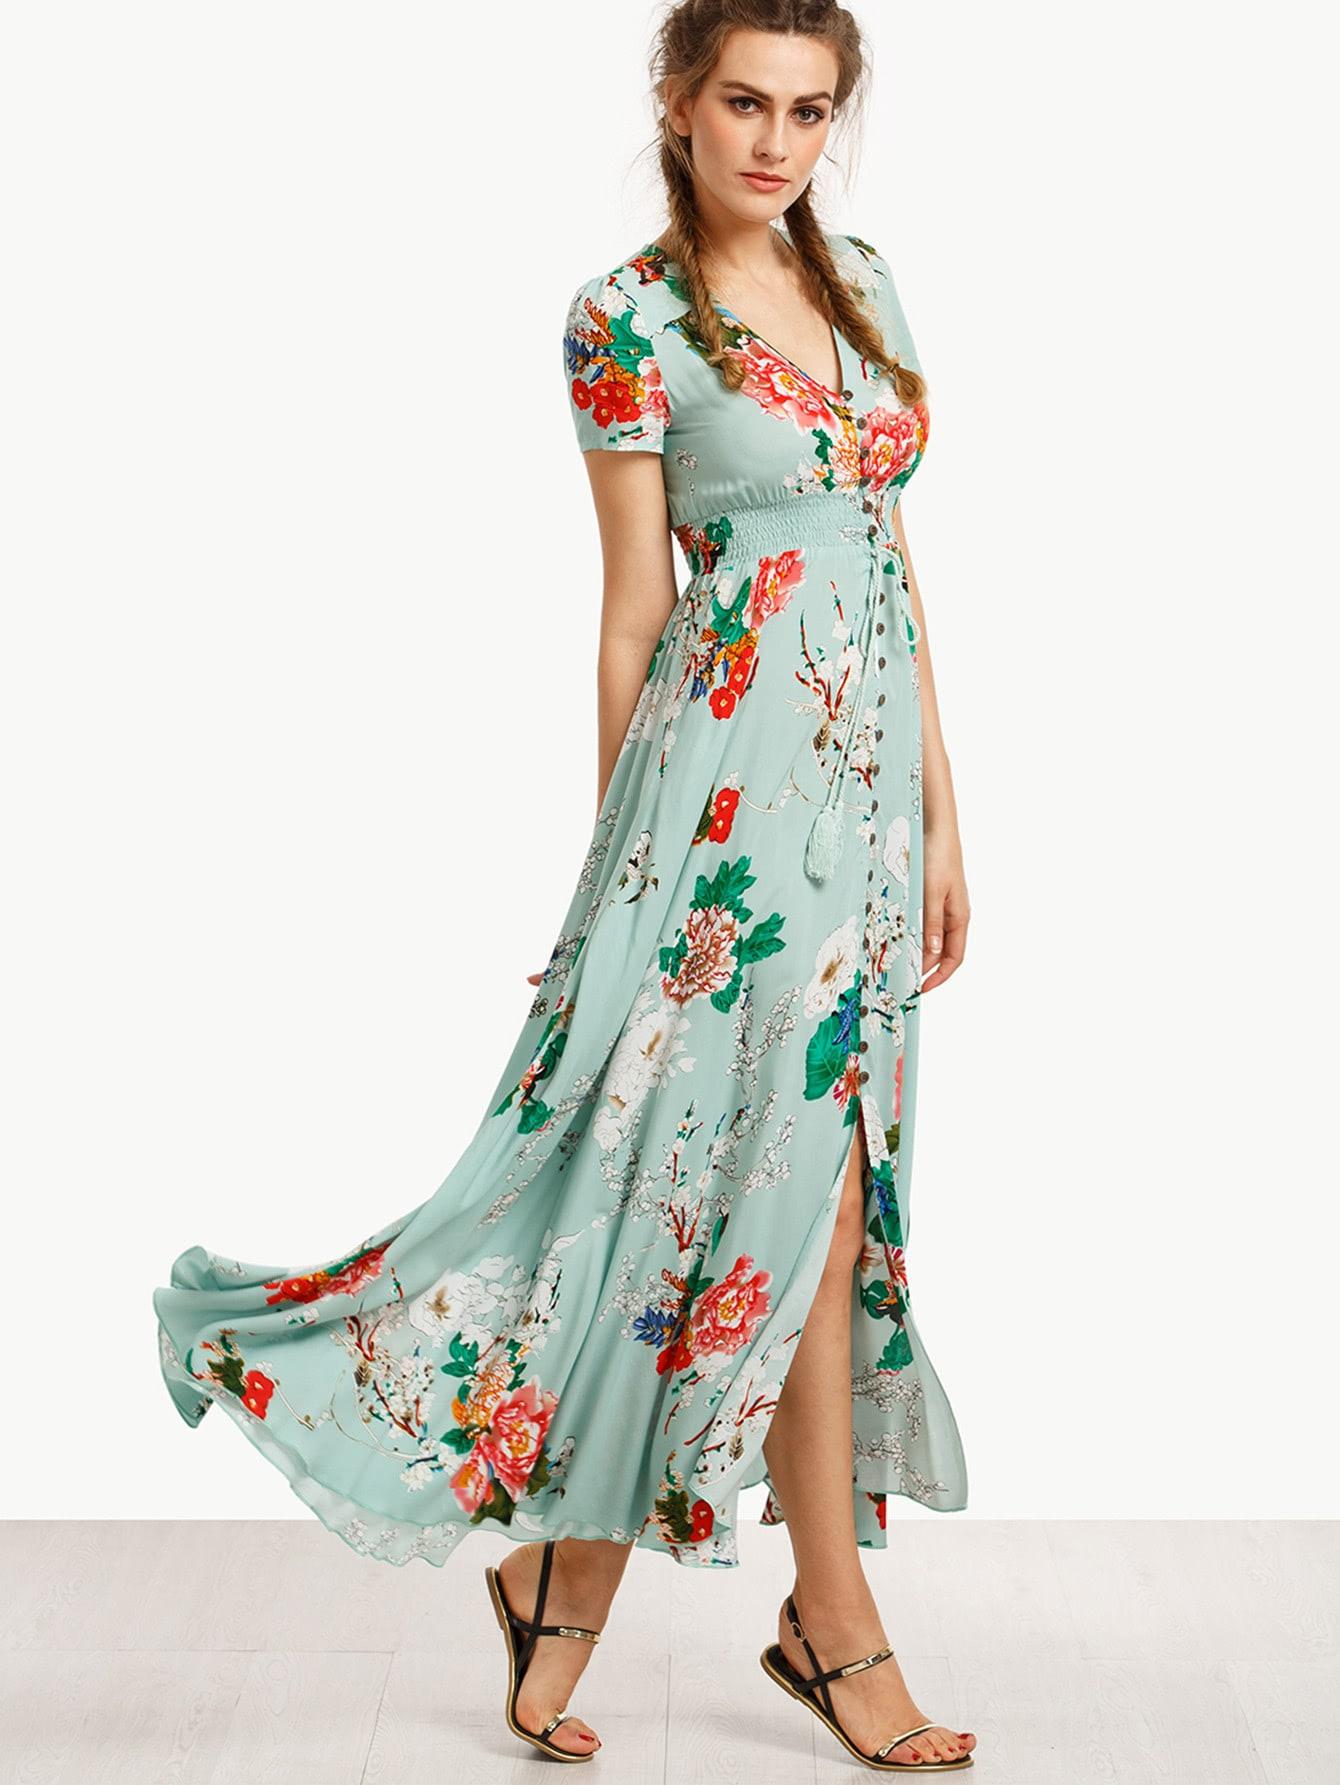 Robe Longue Imprime Fleuri Manche Courte French Romwe